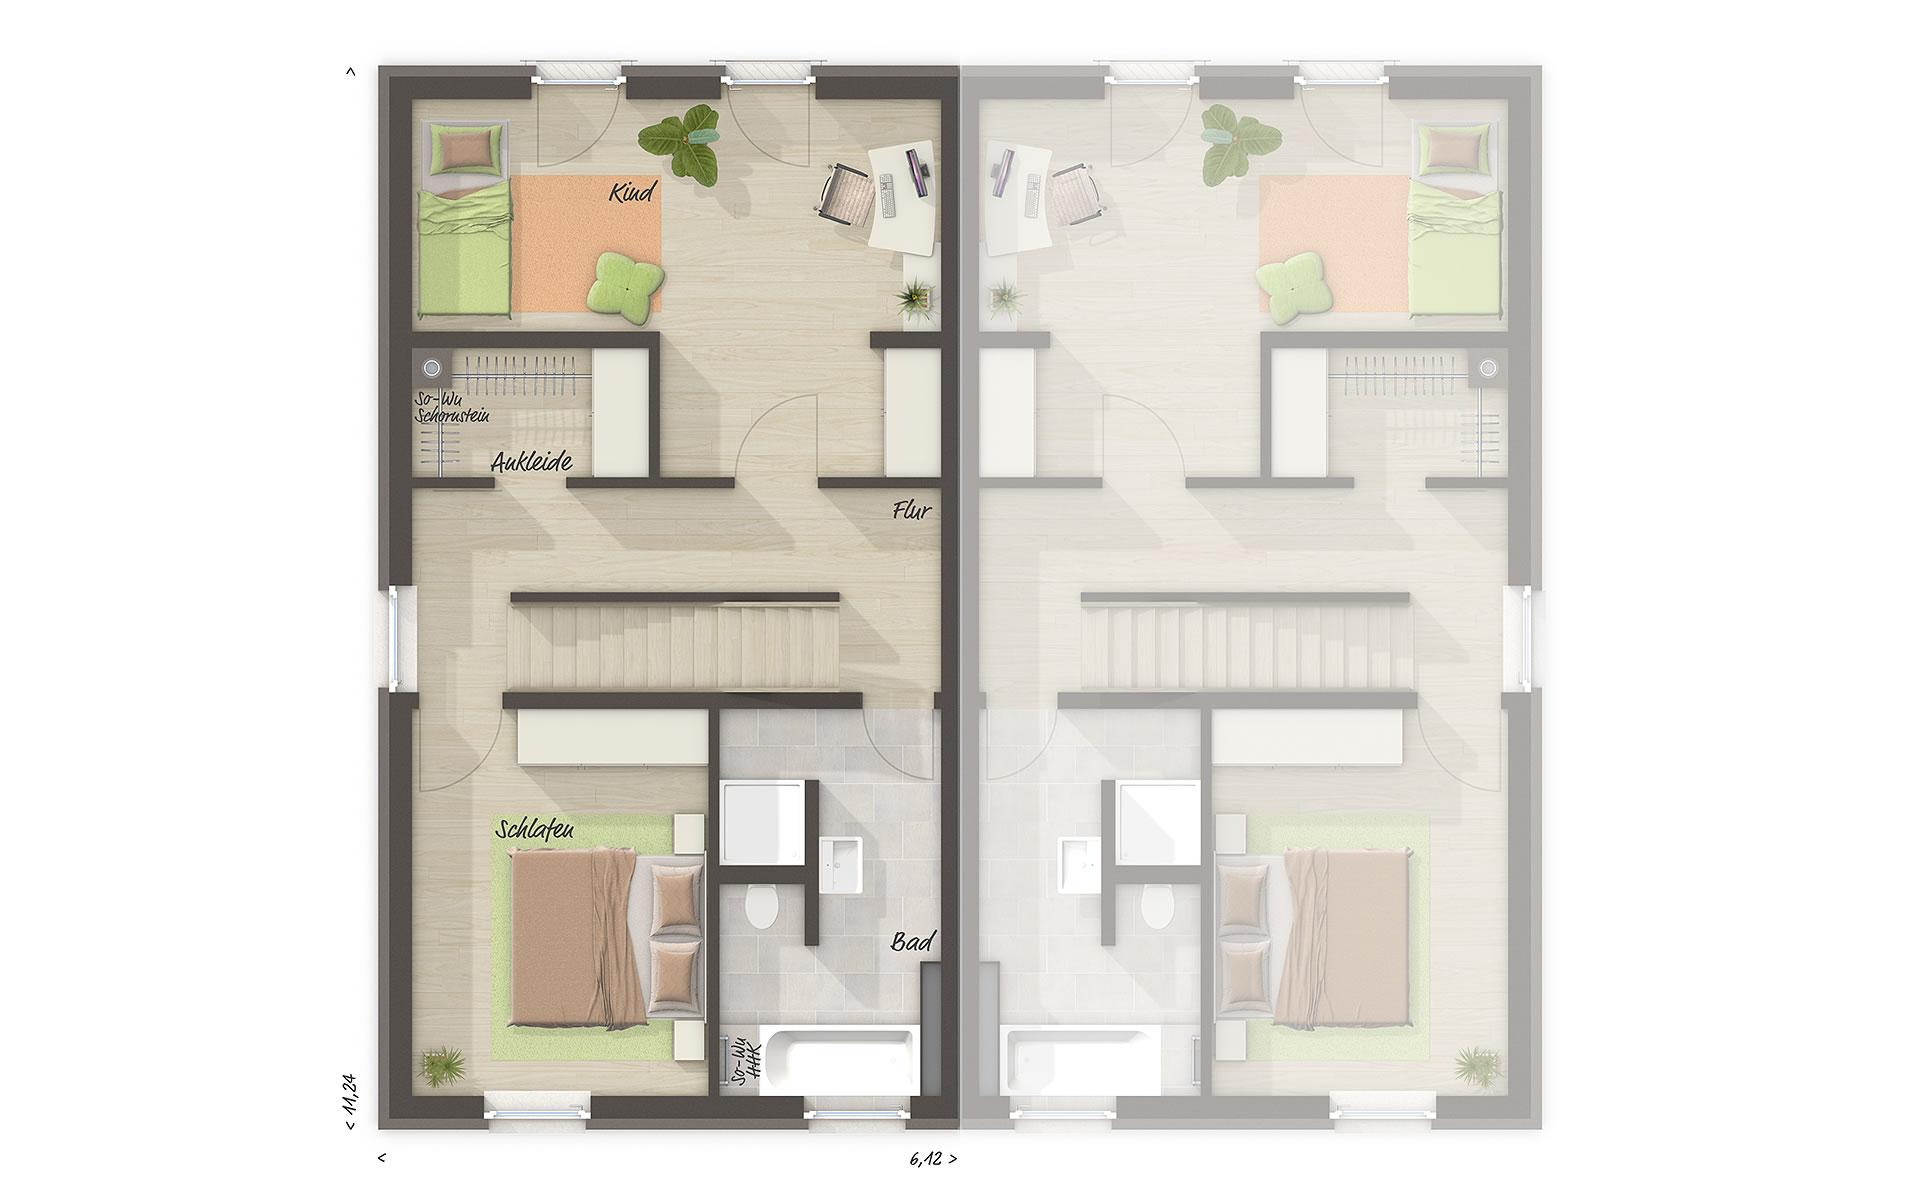 Obergeschoss Doppelhaus Mainz 128 - modern DT von Town & Country Haus Lizenzgeber GmbH